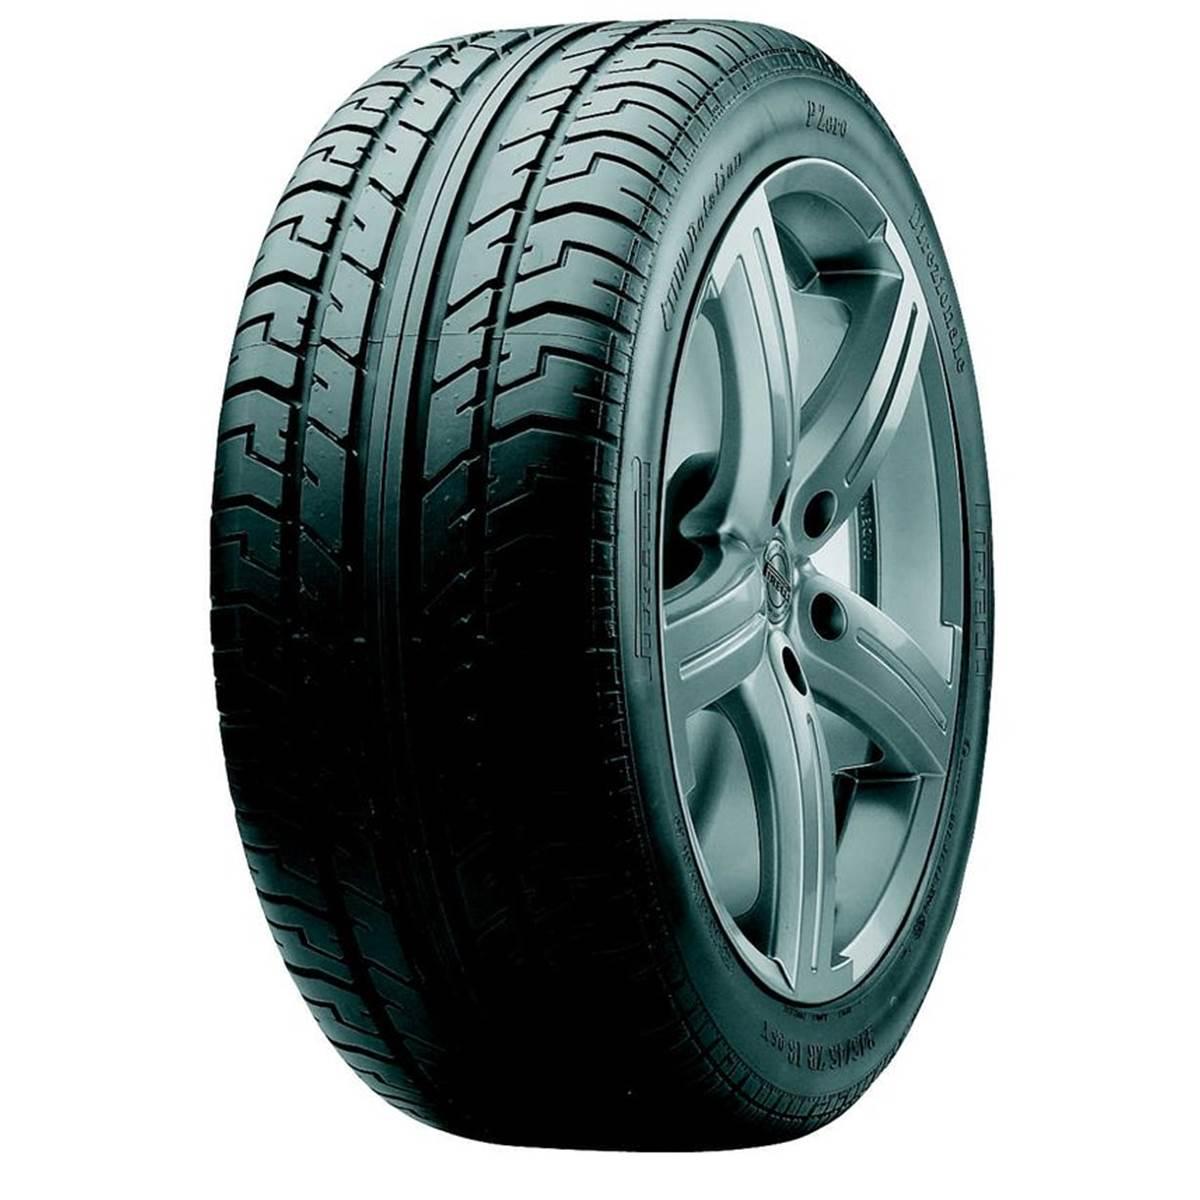 Pneu Pirelli 215/45R18 89Y Pzero Direzionale